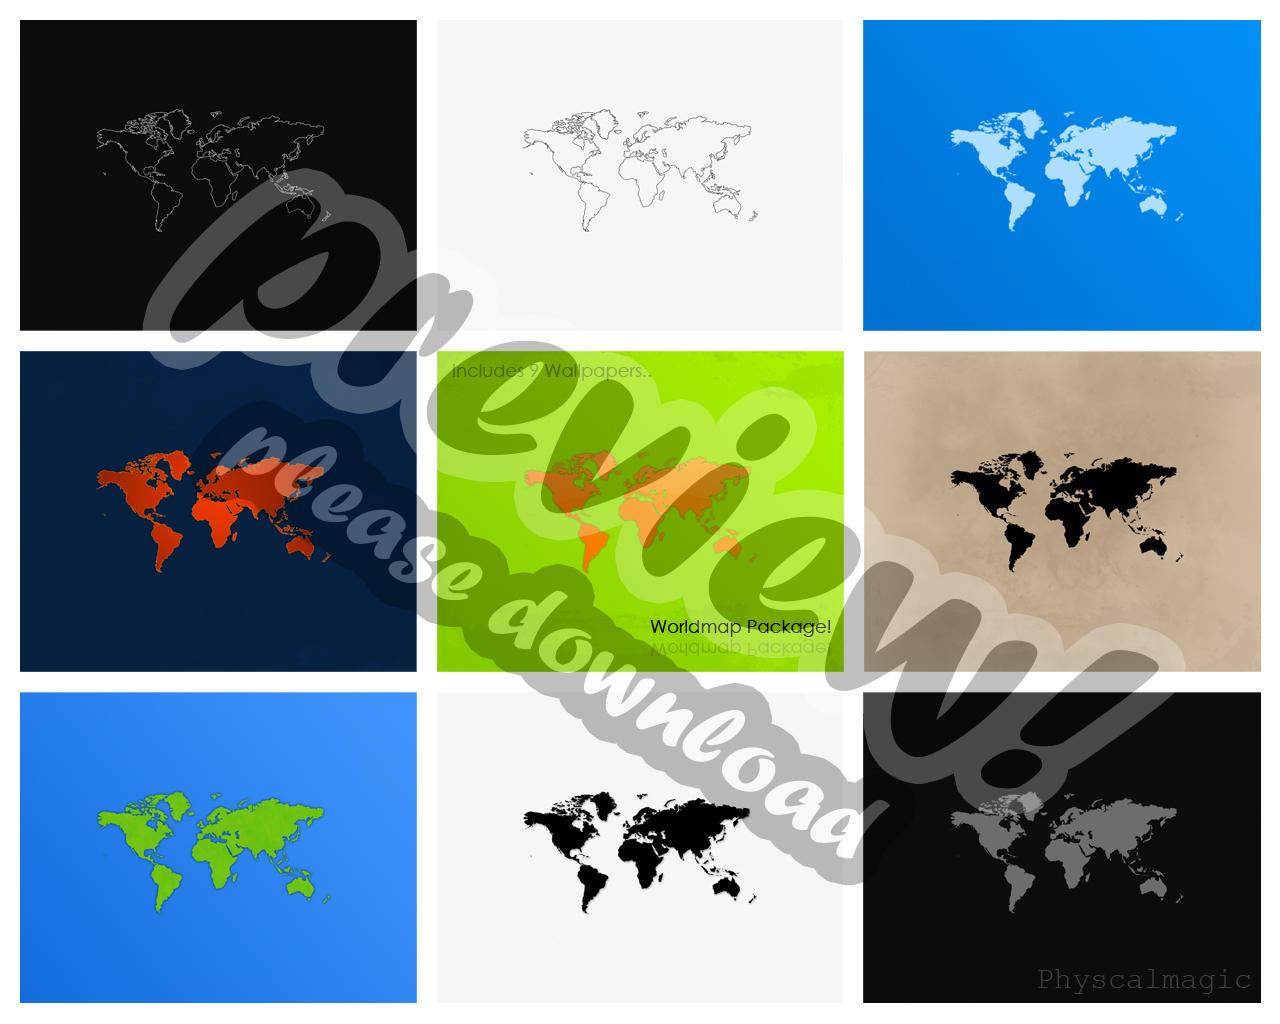 Worldmap Pack by PhysicalMagic